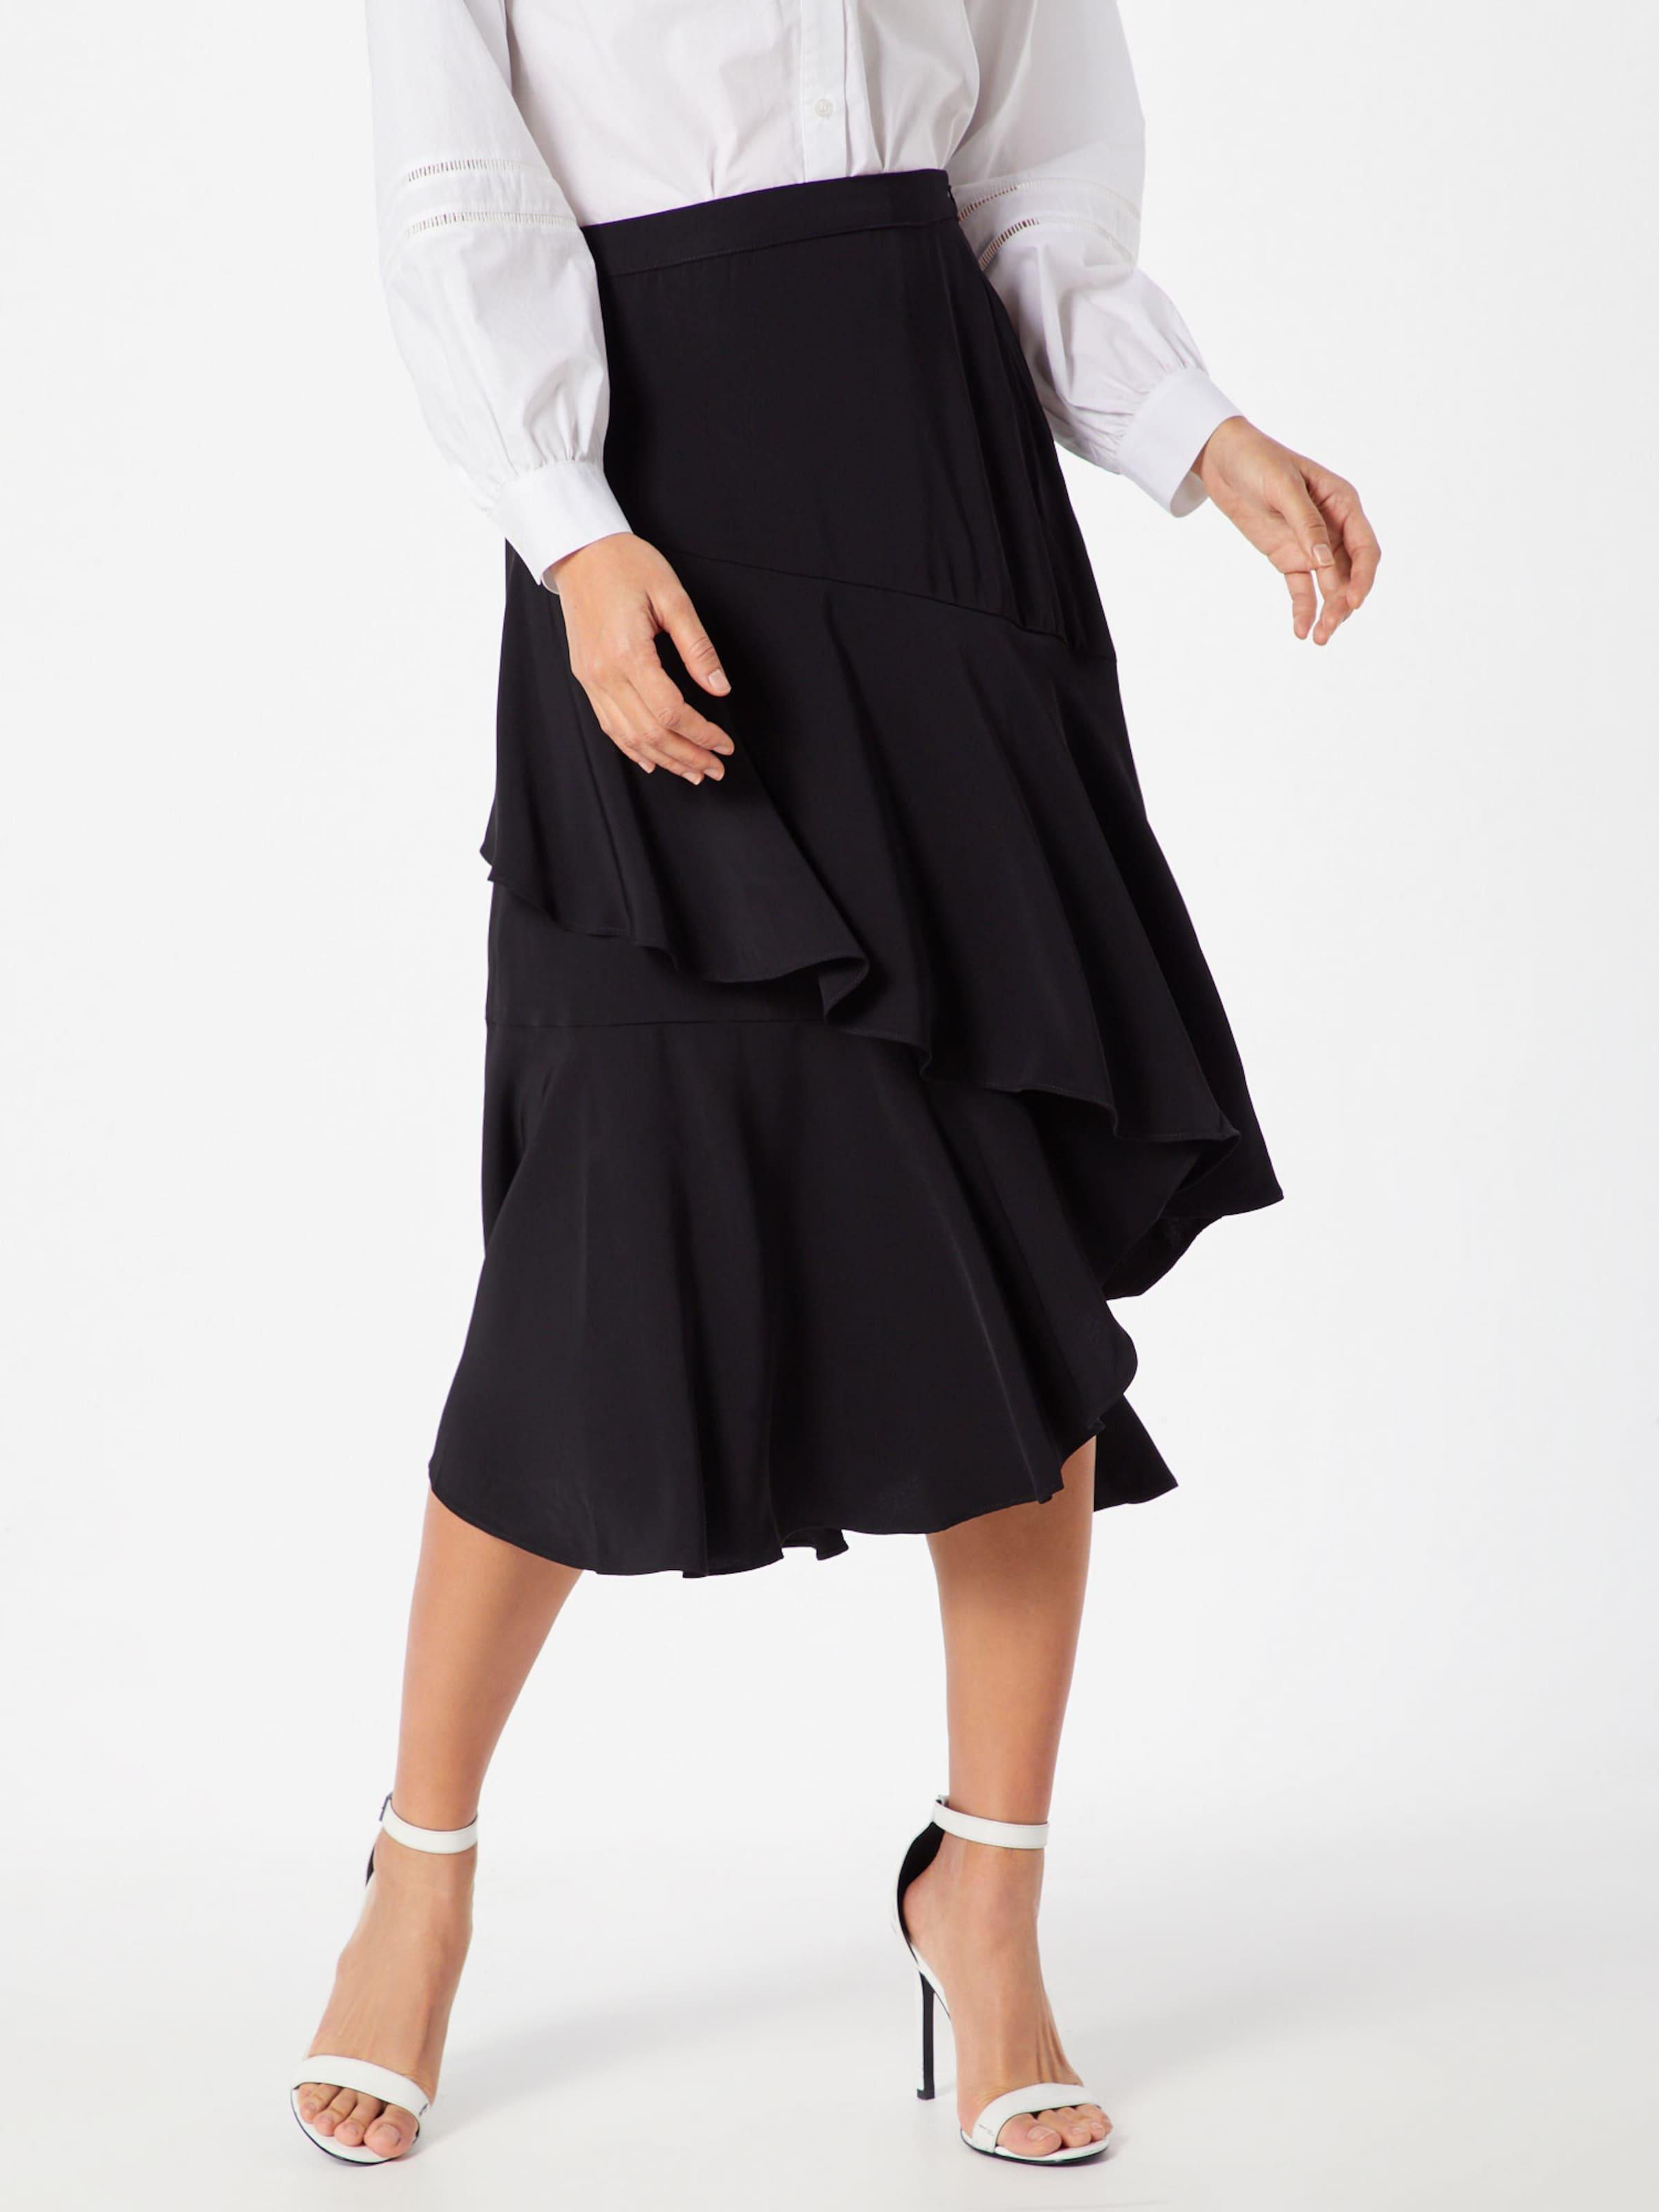 In Skirt' Gestuz 'rubina DamenRöcke Schwarz ONknwPX08